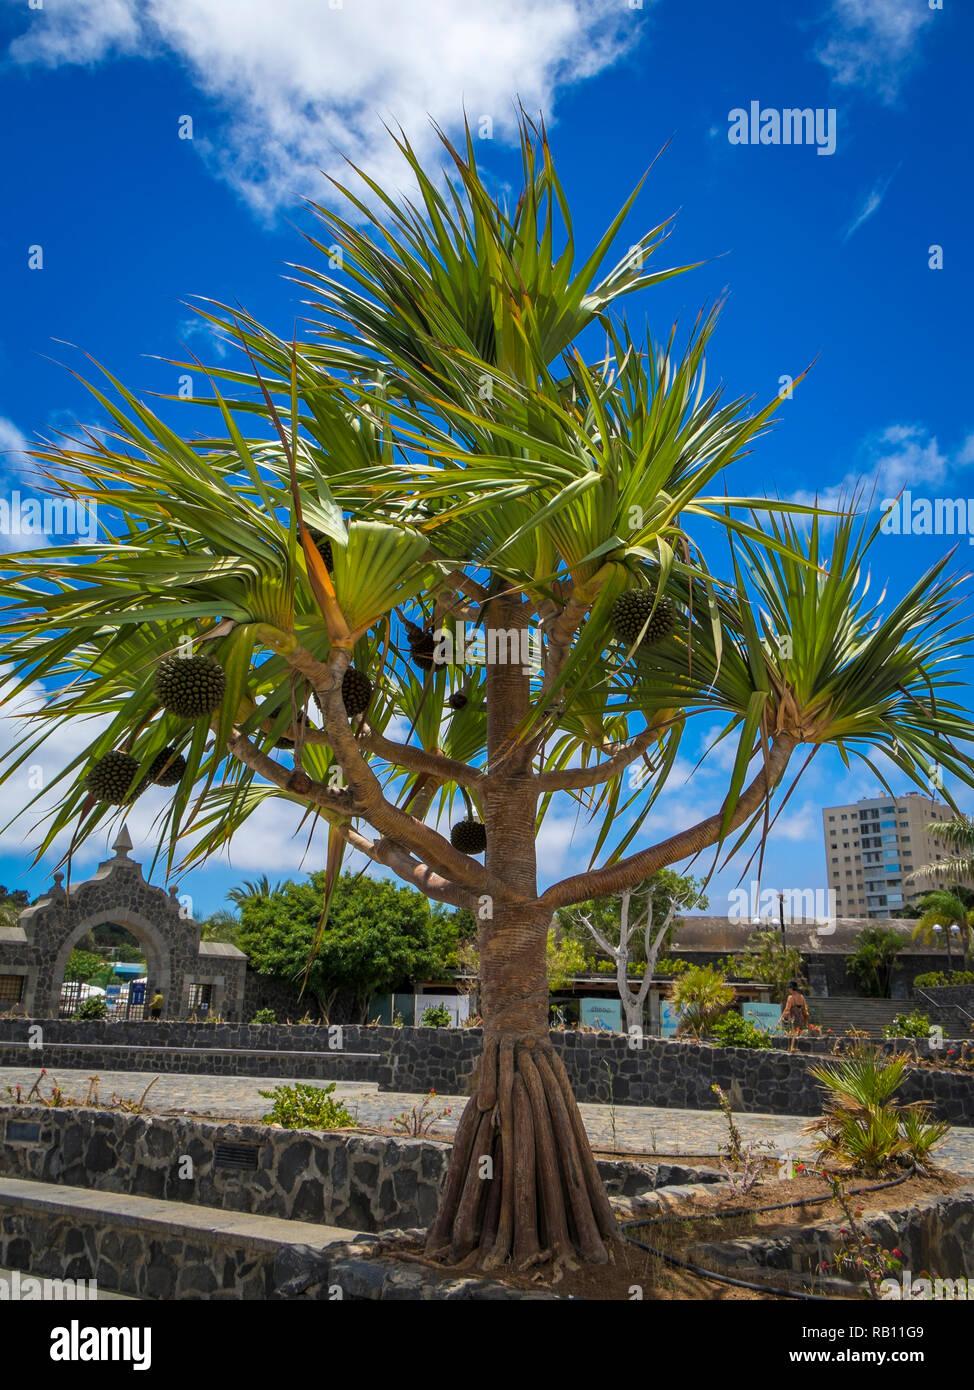 Baum an der Promenade in Santa Cruz, Teneriffa - Stock Image